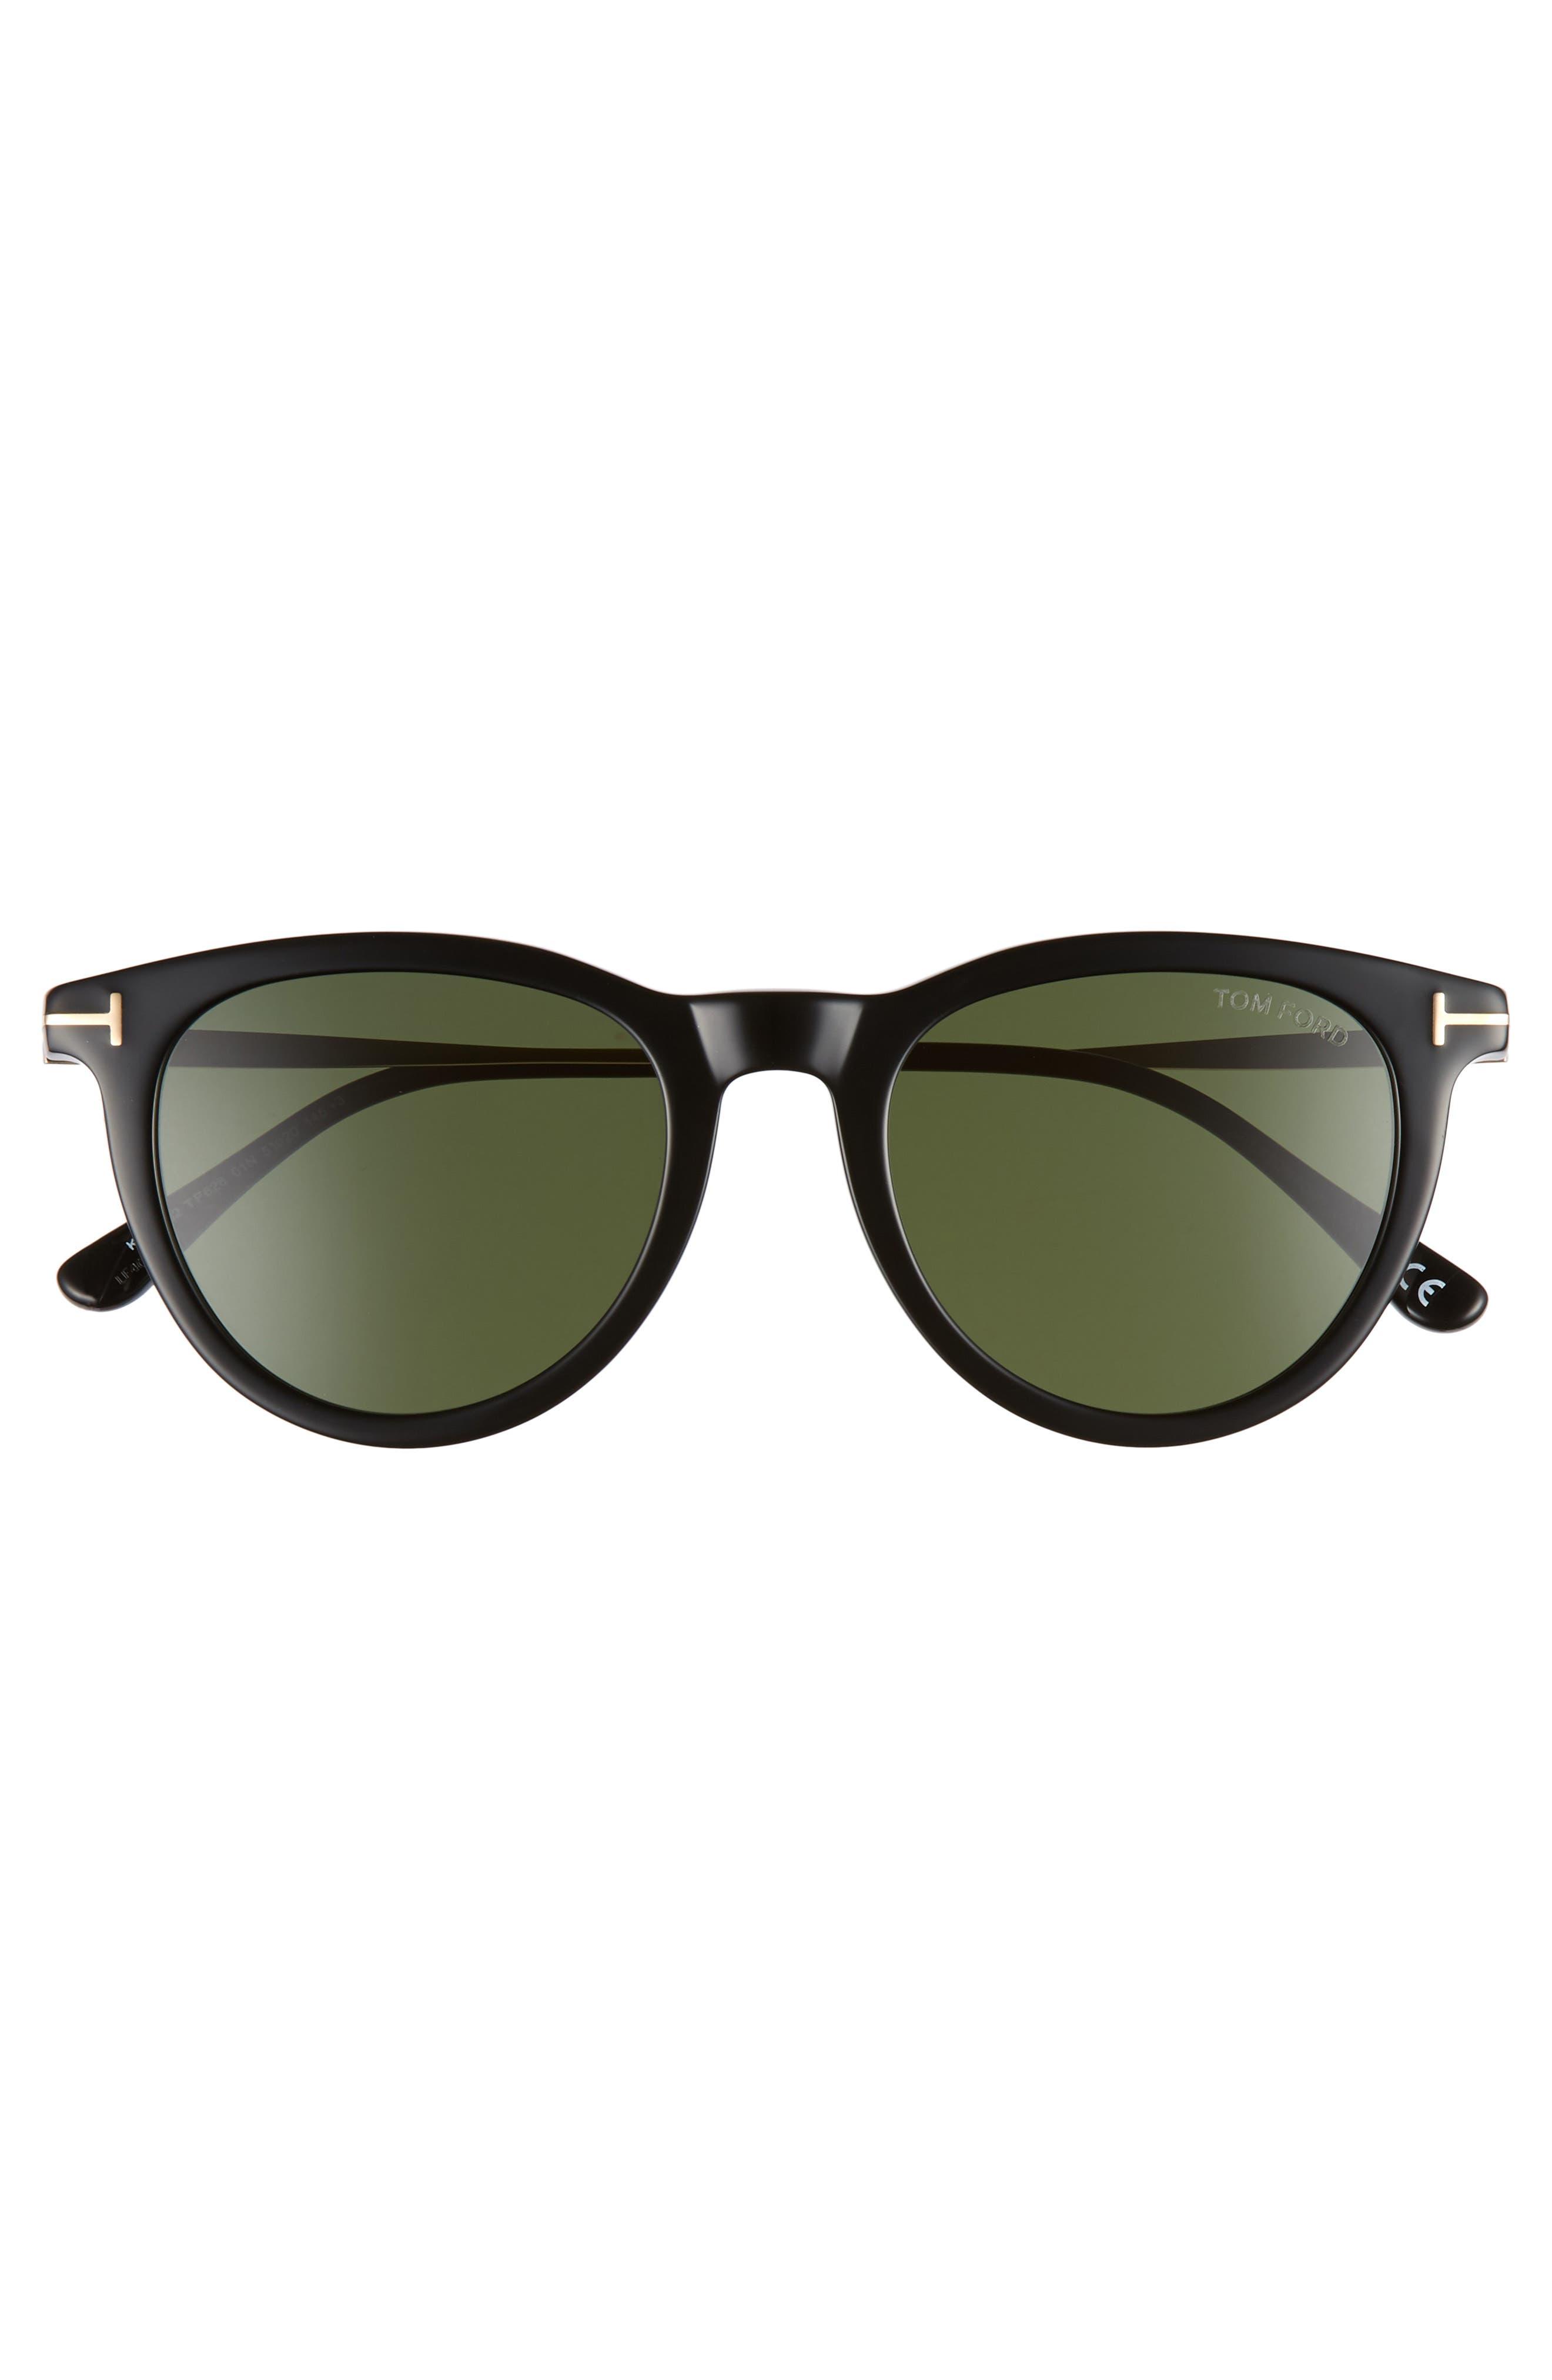 51mm Cat Eye Sunglasses,                             Alternate thumbnail 3, color,                             SHINY BLACK/ GREEN